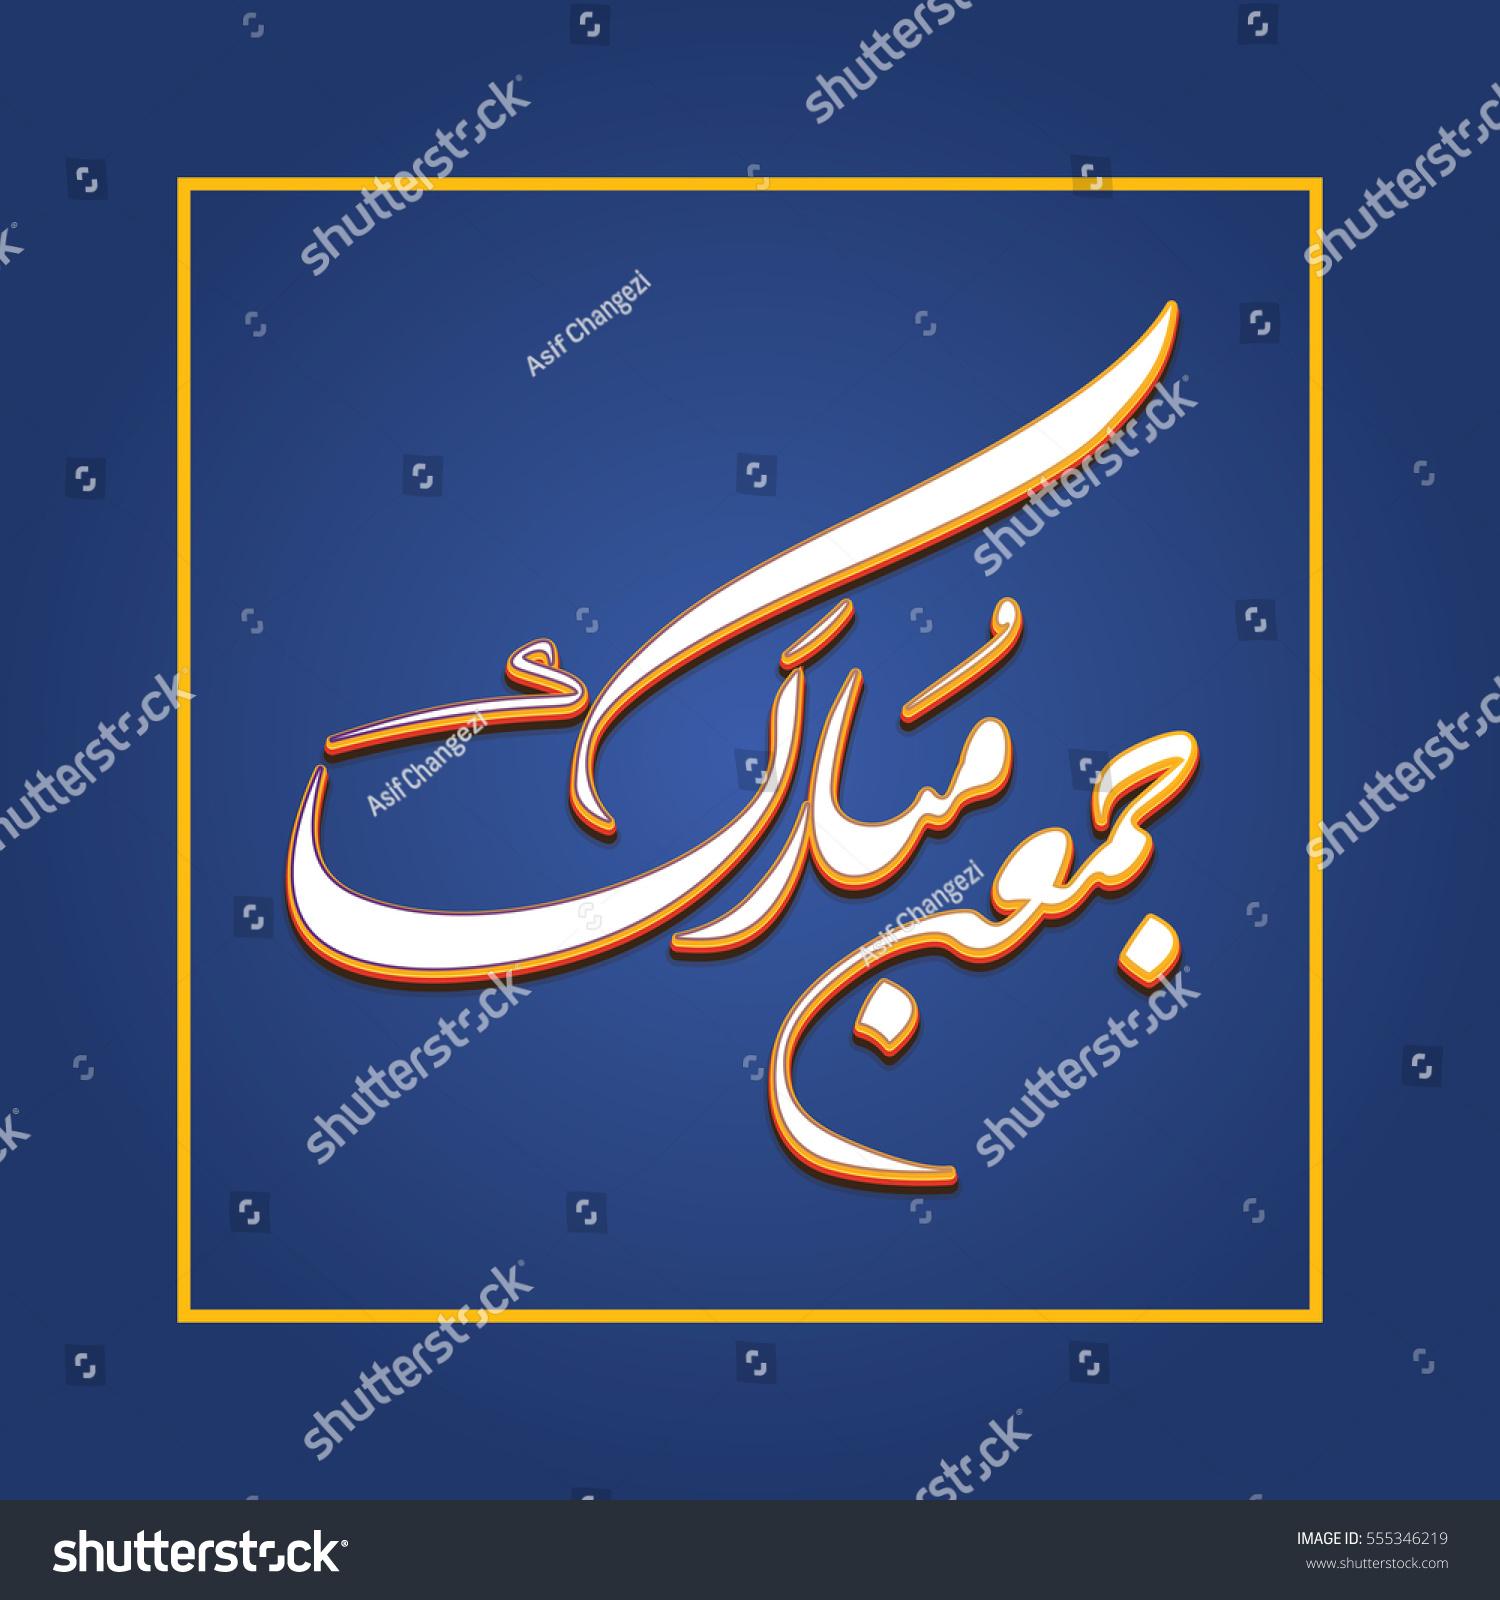 Jumah mubarak vector translated friday greetings stock vector jumah mubarak vector translated as friday greetings written in farsi arabic calligraphy style kristyandbryce Choice Image